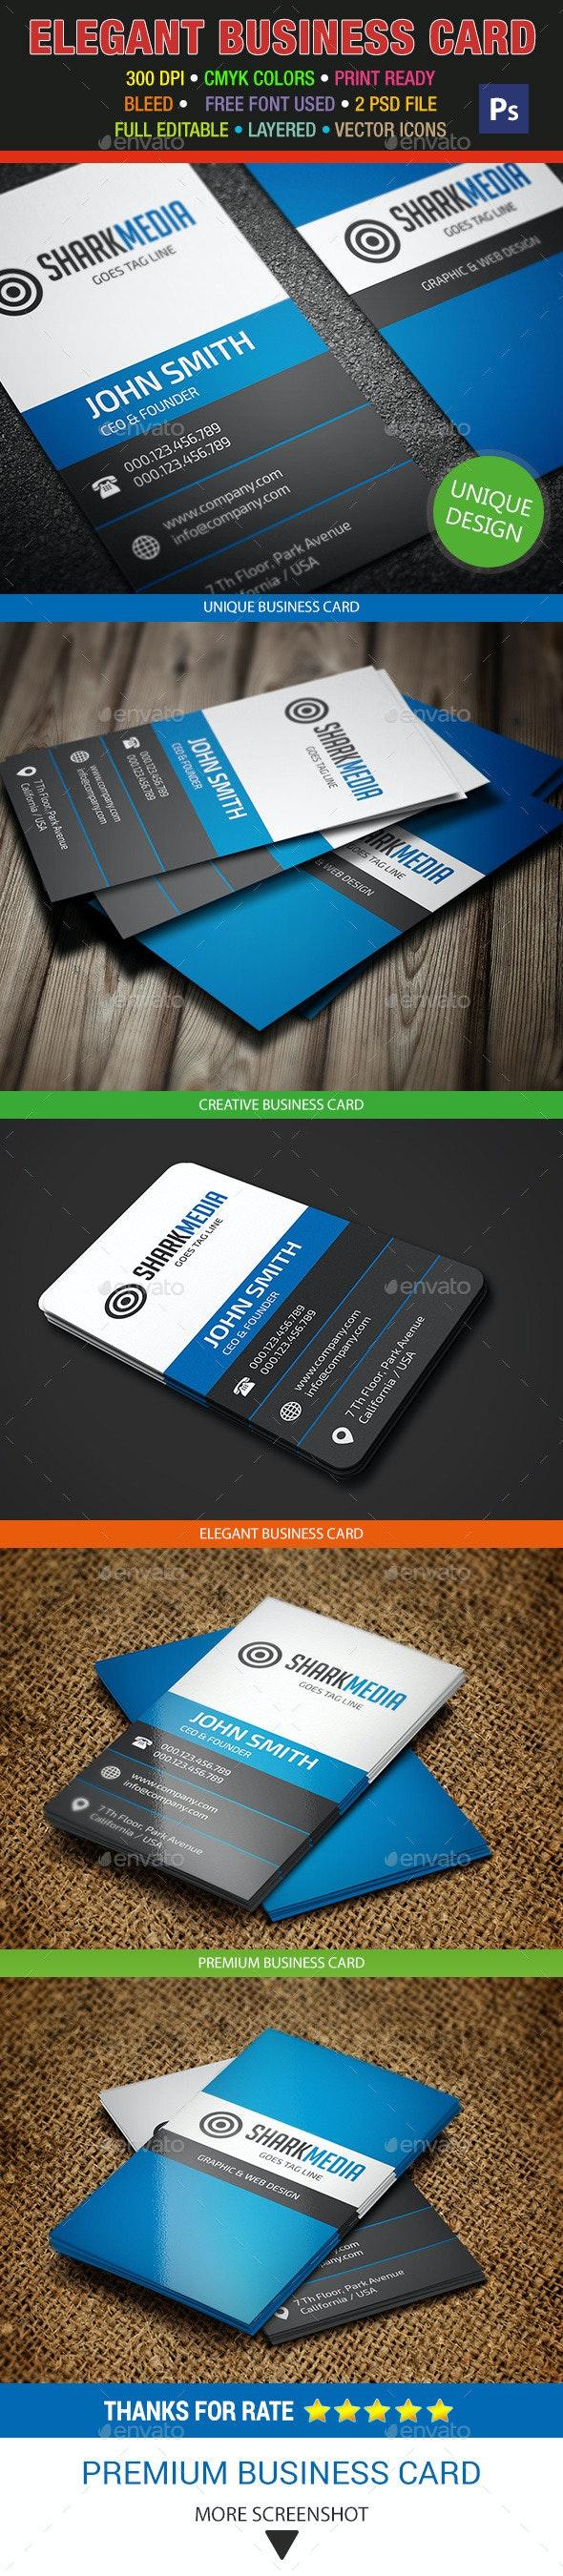 Elegant Business Card 318 - Creative Business Cards